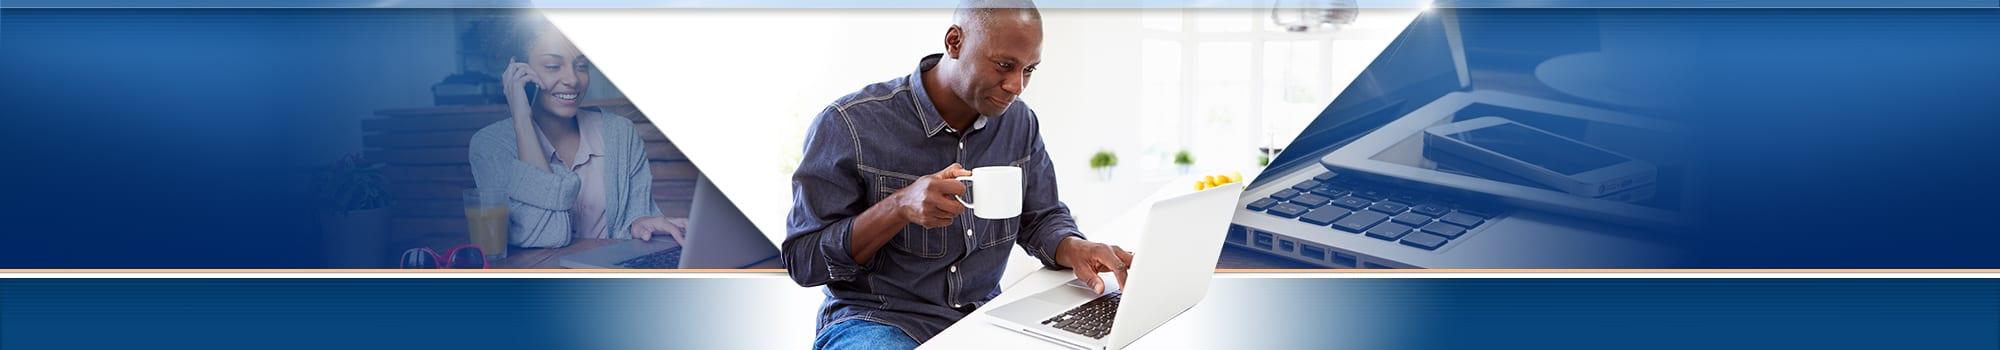 online registrations